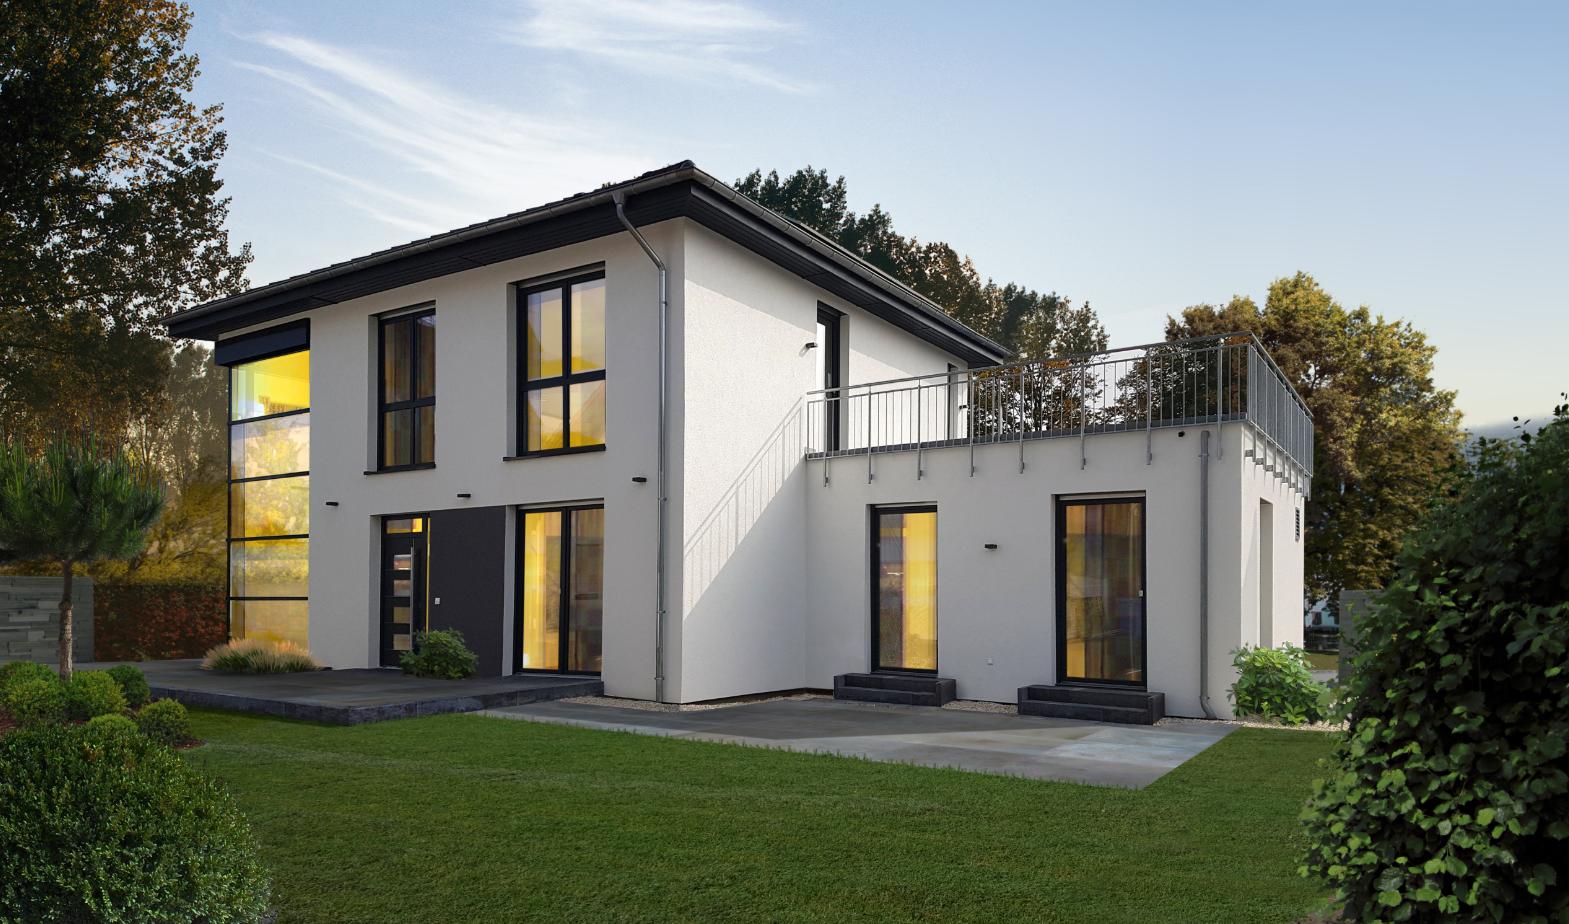 allkauf haus - Musterhaus Ulm